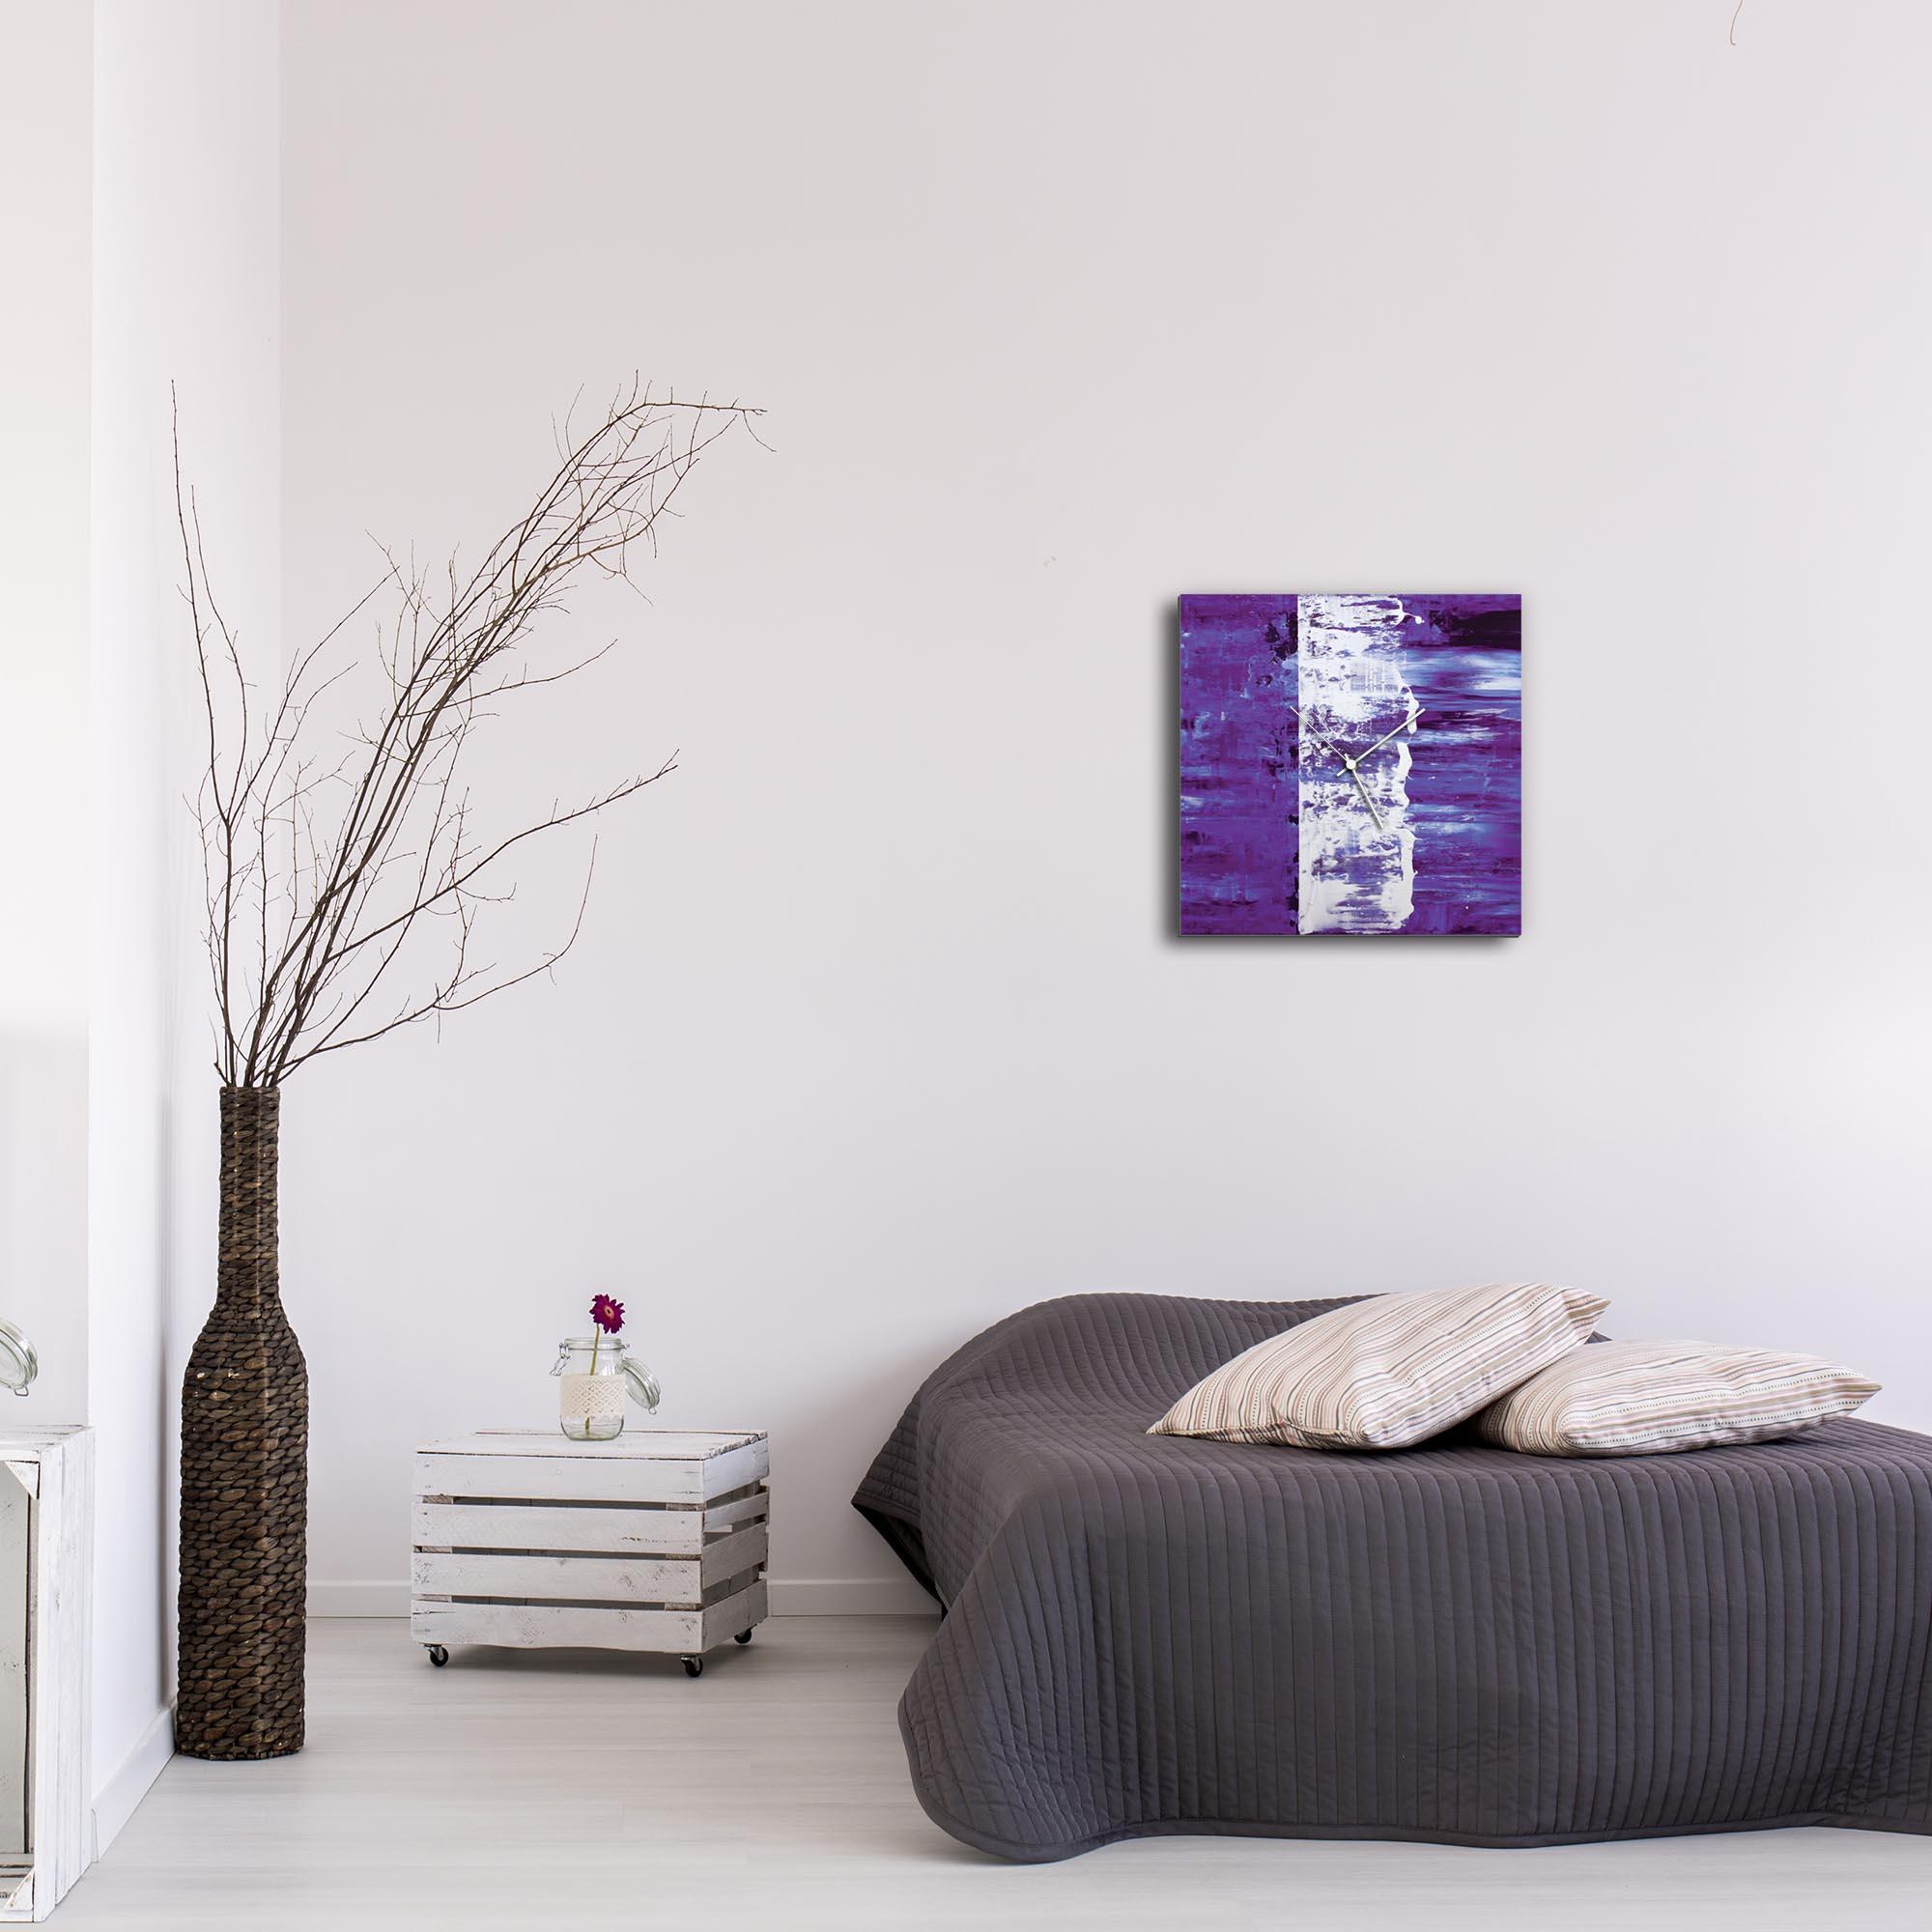 Purple Street Square Clock by Mendo Vasilevski - Urban Abstract Home Decor - Lifestyle View